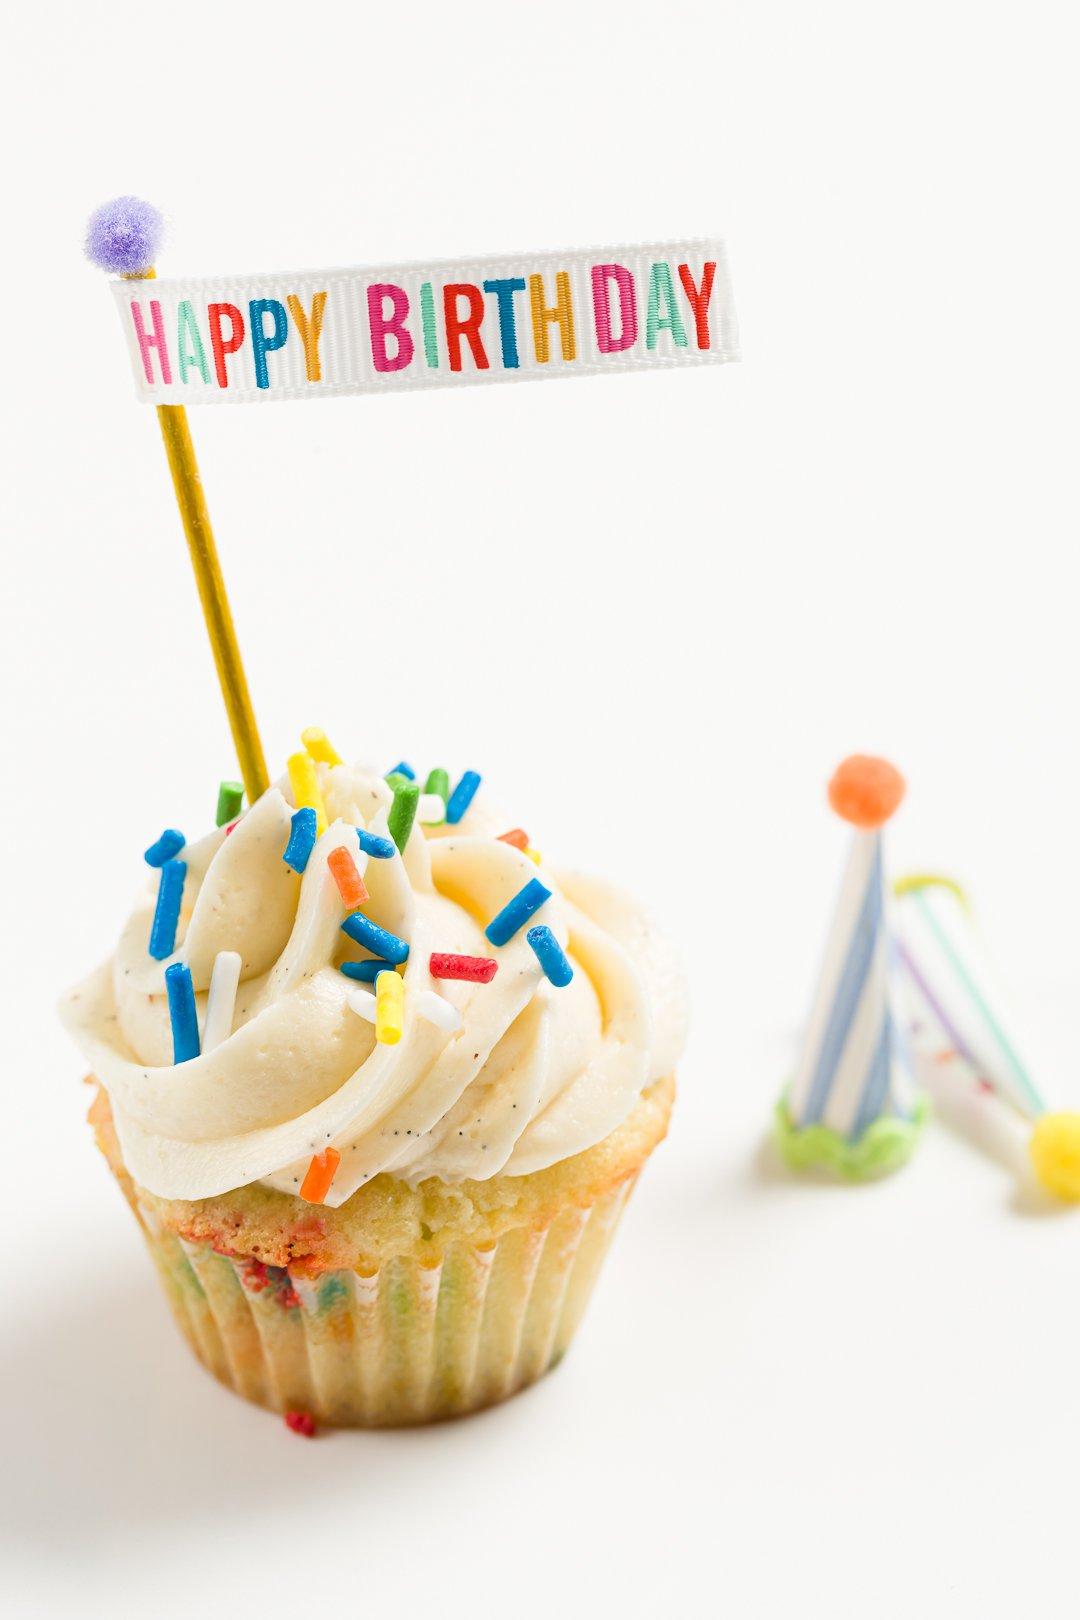 Happy birthday banner on a birthday cupcake